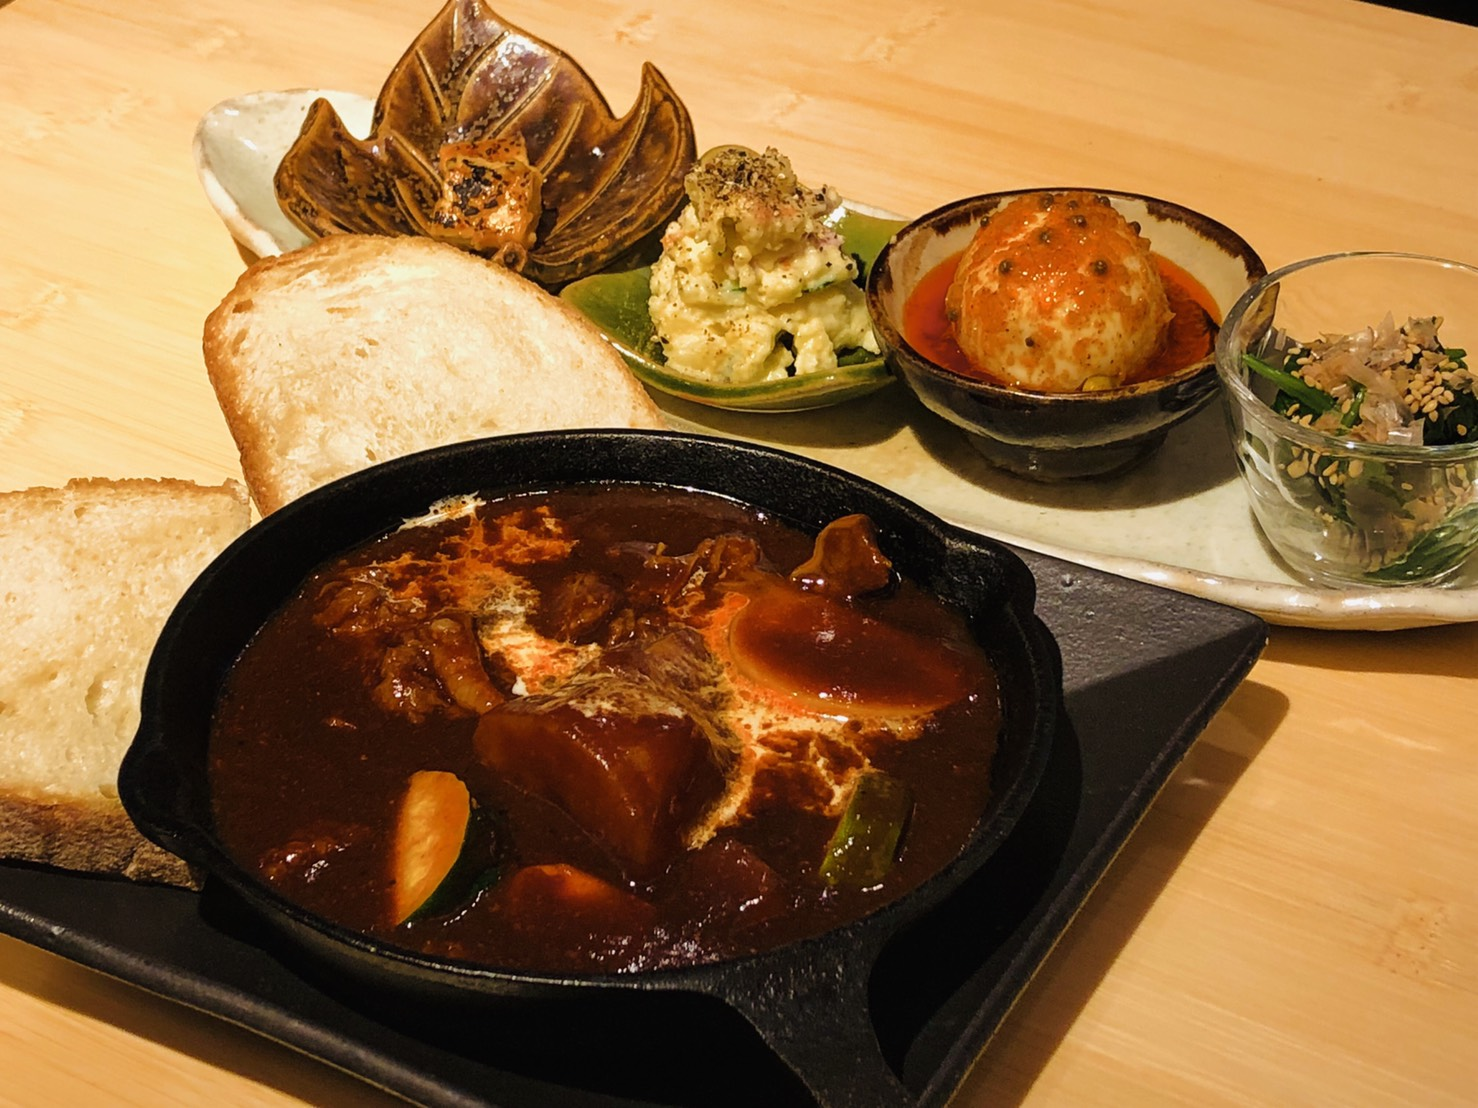 VegeLabo(ベジラボ)|おろし野菜カレーバゲット、豚しゃぶニンニクバルサミコソース